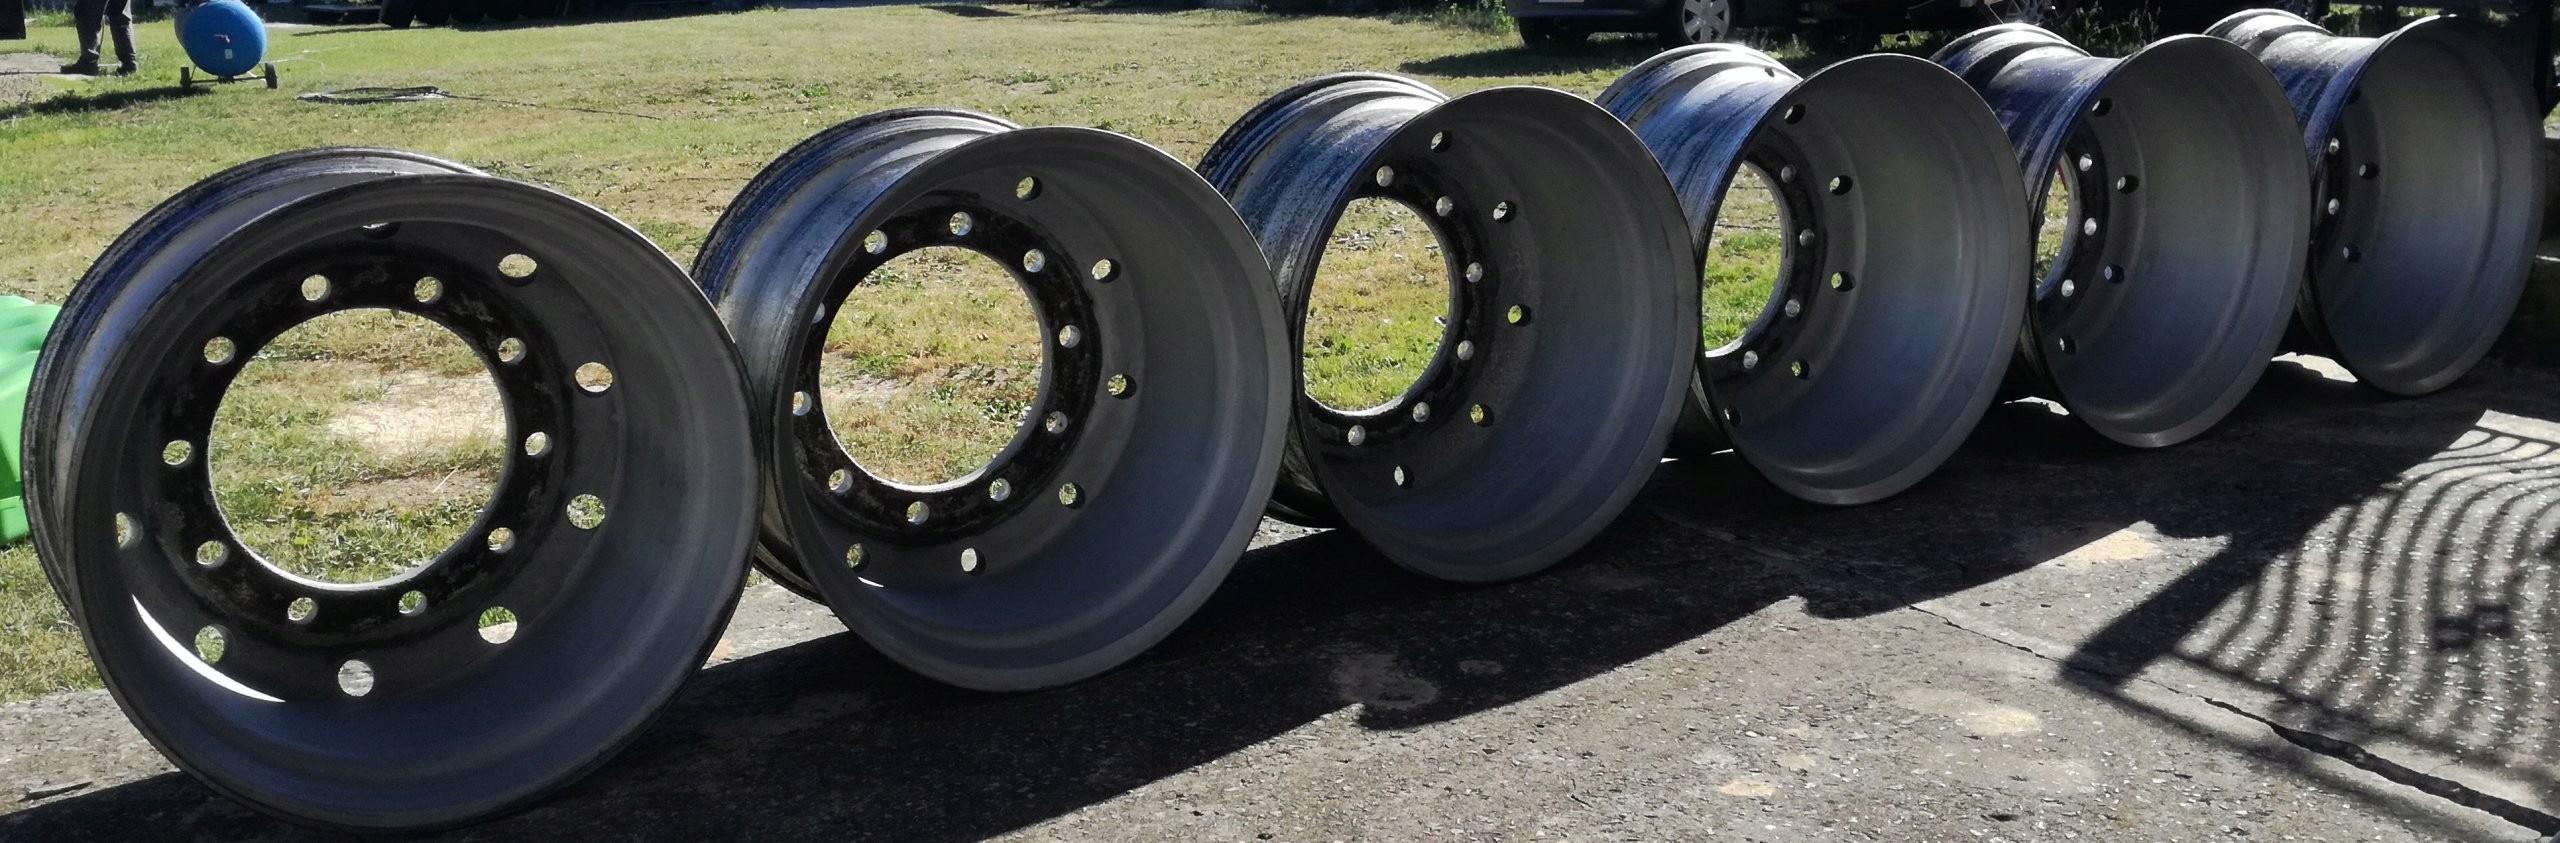 Alufelgi Felgi Aluminiowe Do Naczepy 225 Komplet 7389222508